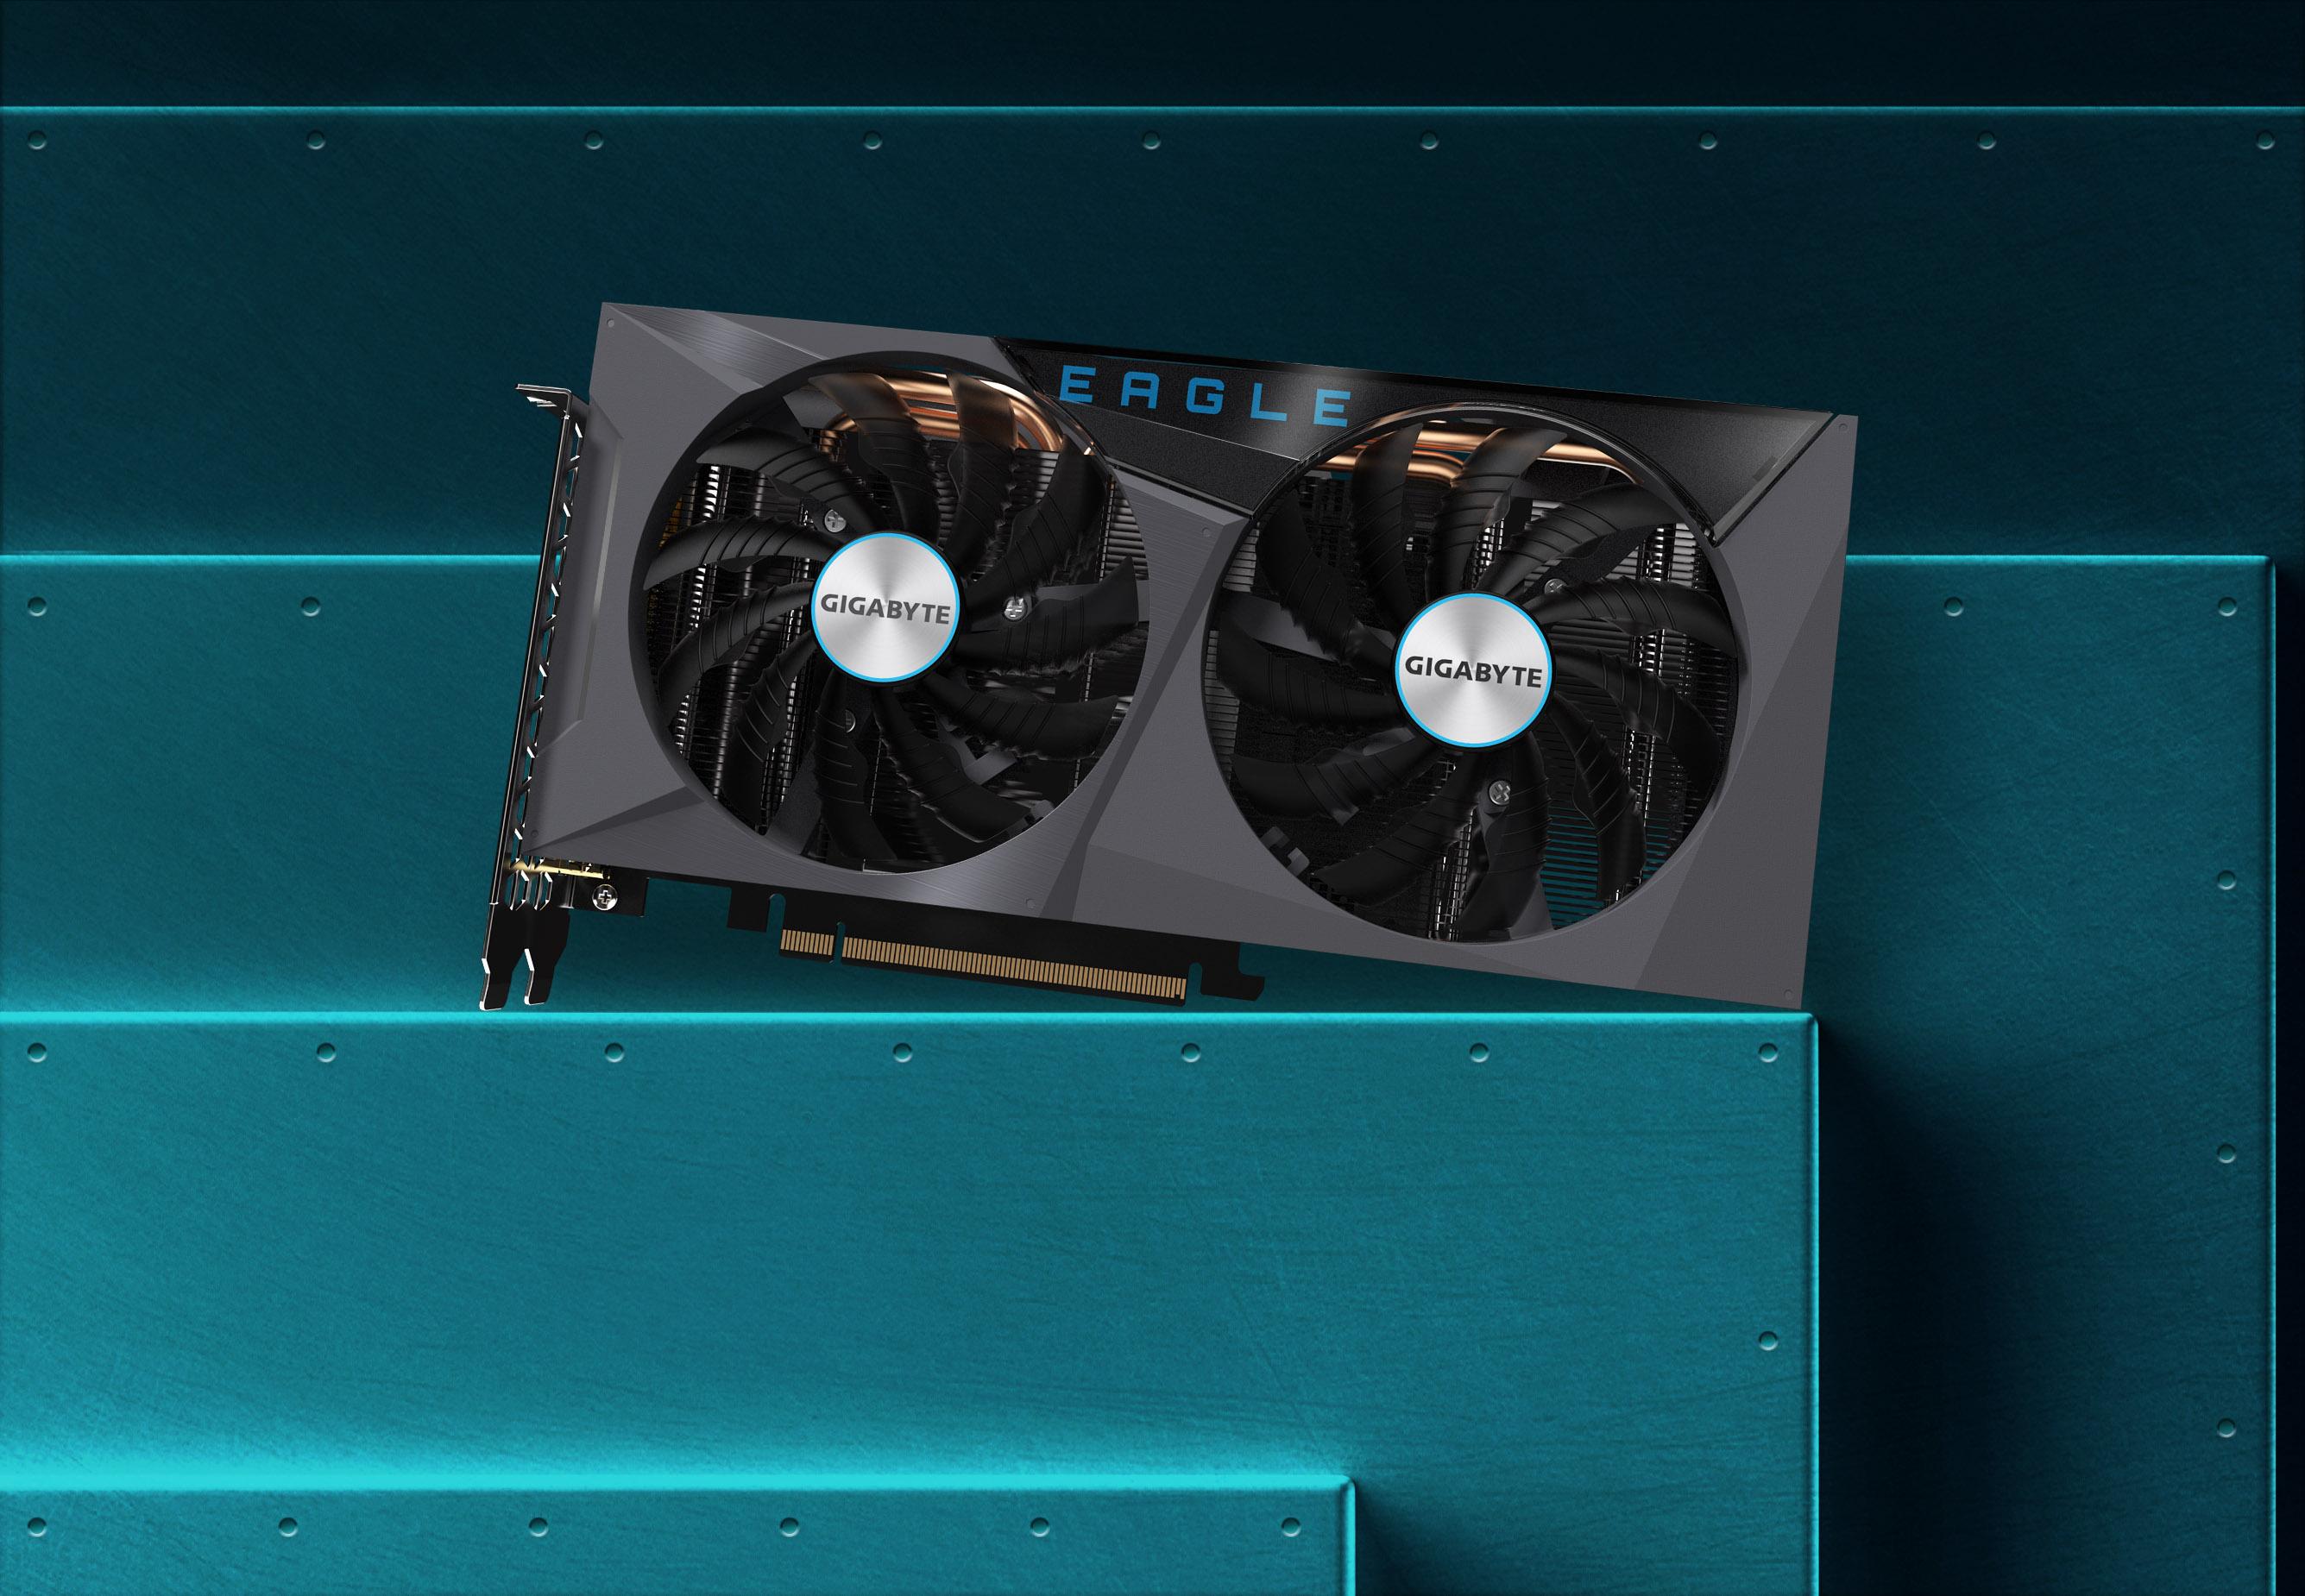 Gigabyte GeForce RTX 3060 EAGLE OC 12G - GV-N3060EAGLE OC-12GD 9